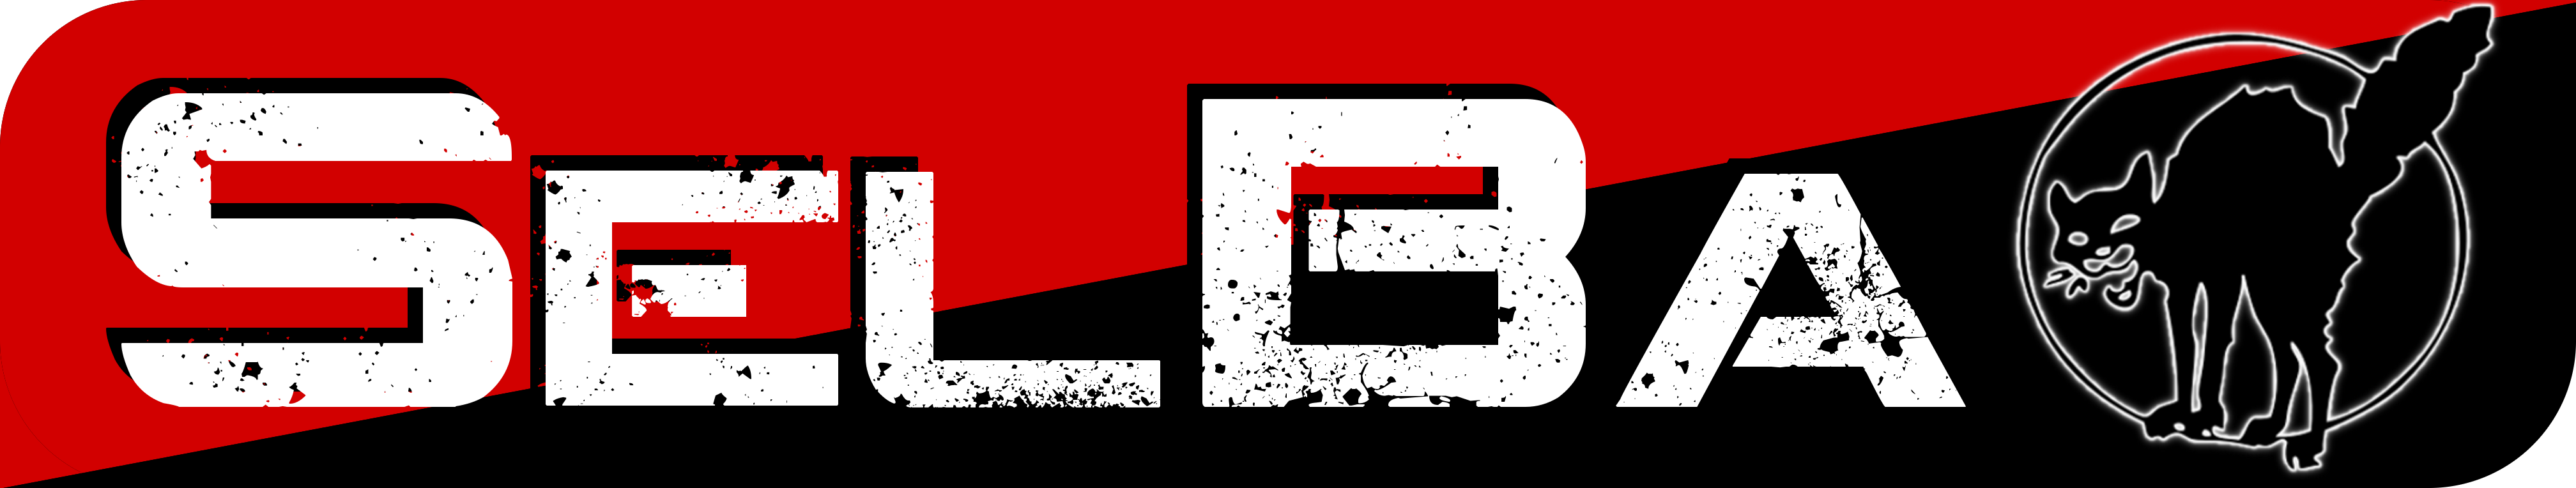 selbastorganisierte Basisgewerkschaft